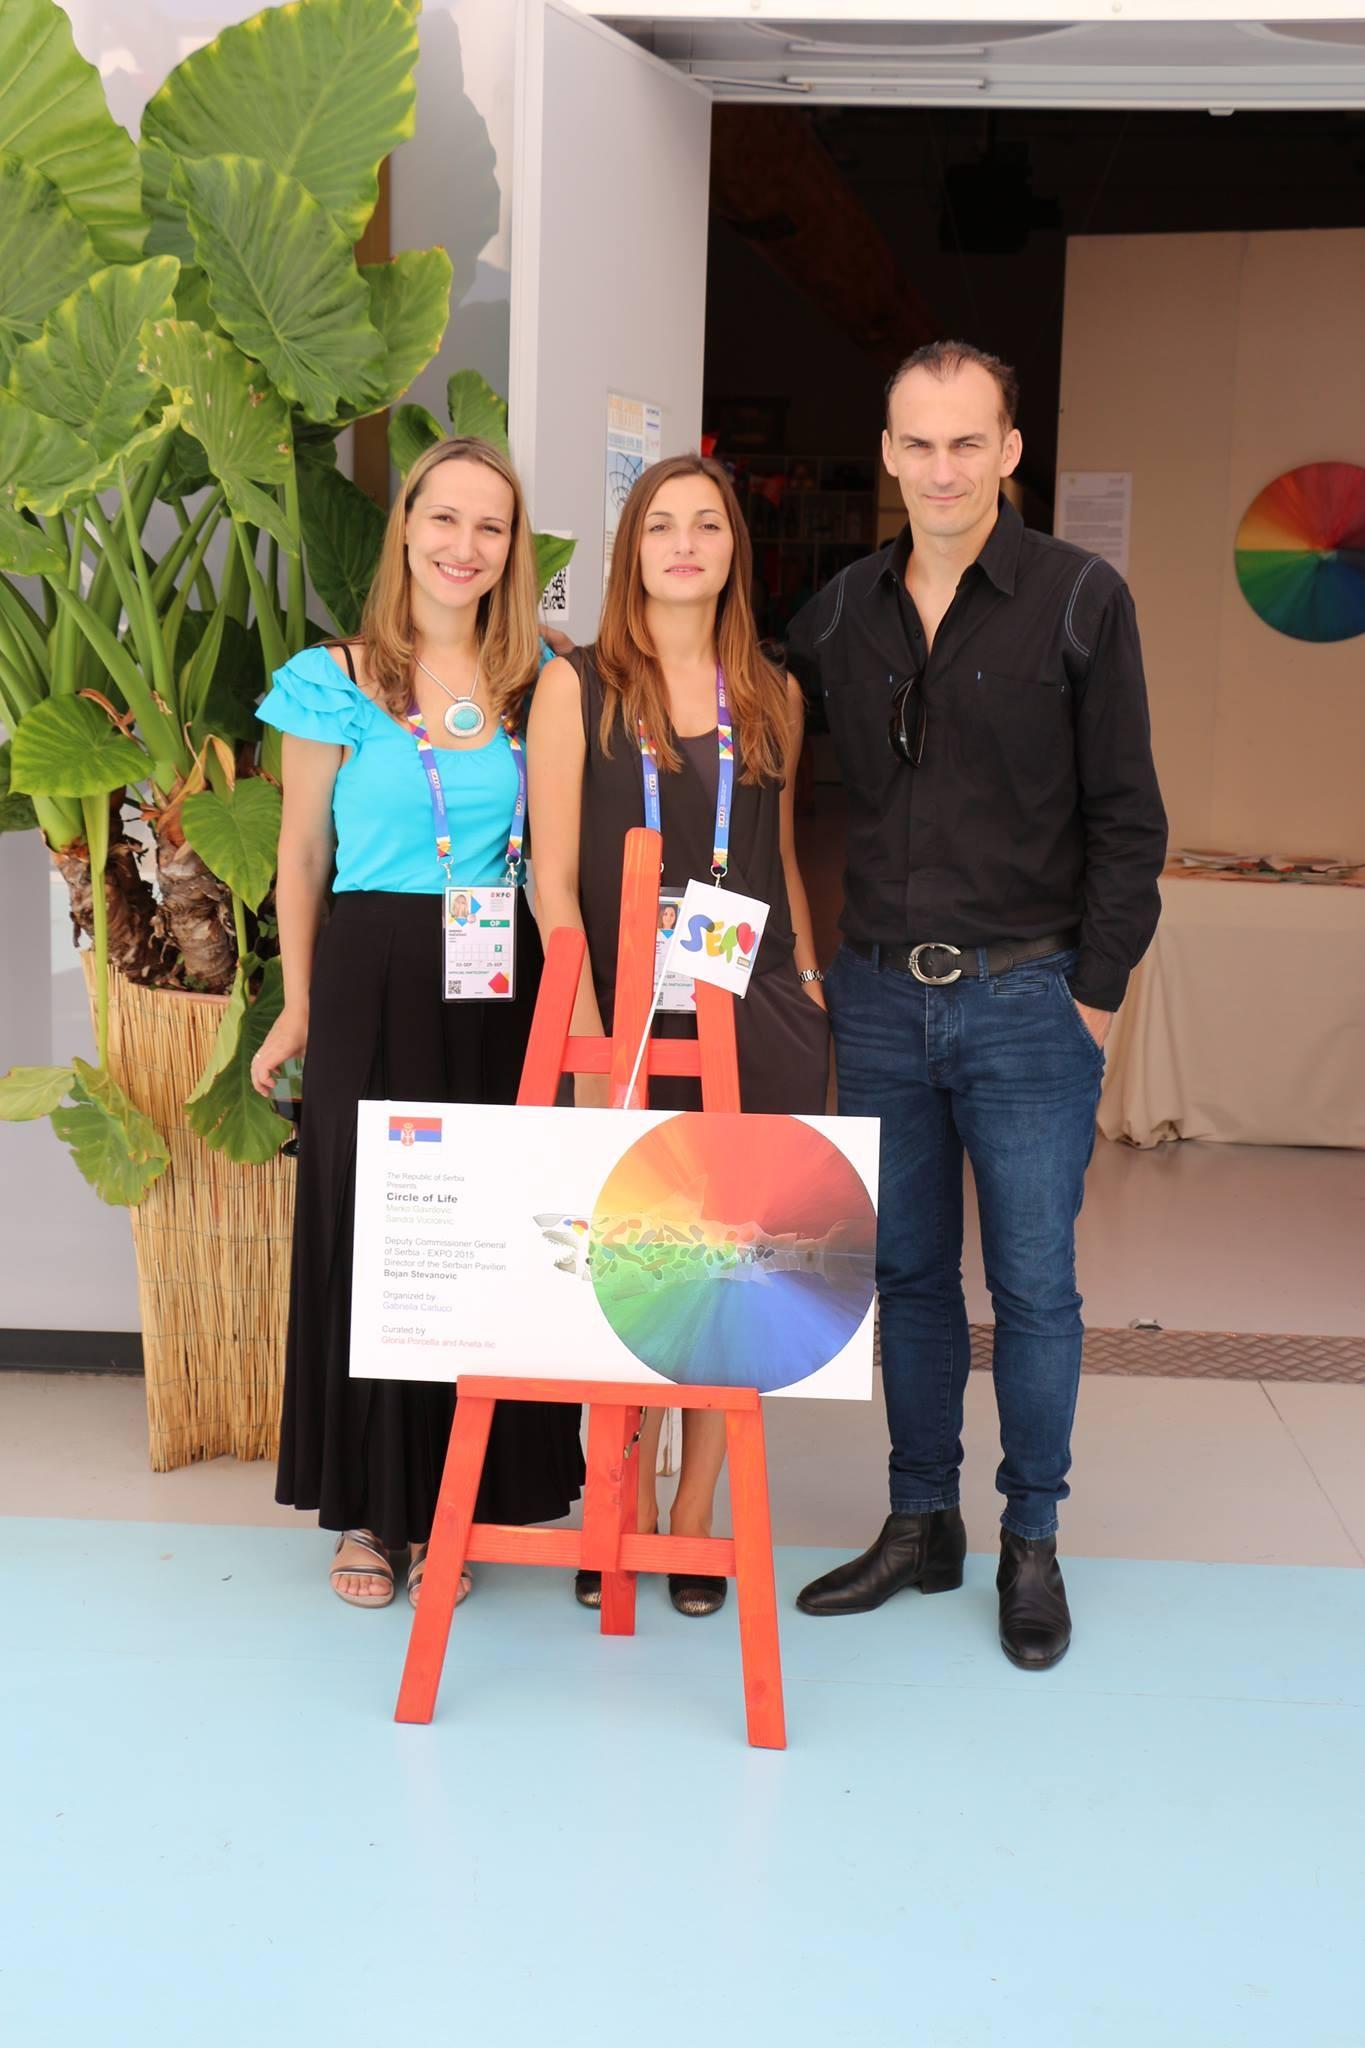 Sandra Vucicevic, Aneta Ilic, Marko Gavrilovic Circle of Life, Milan EXPO 2015